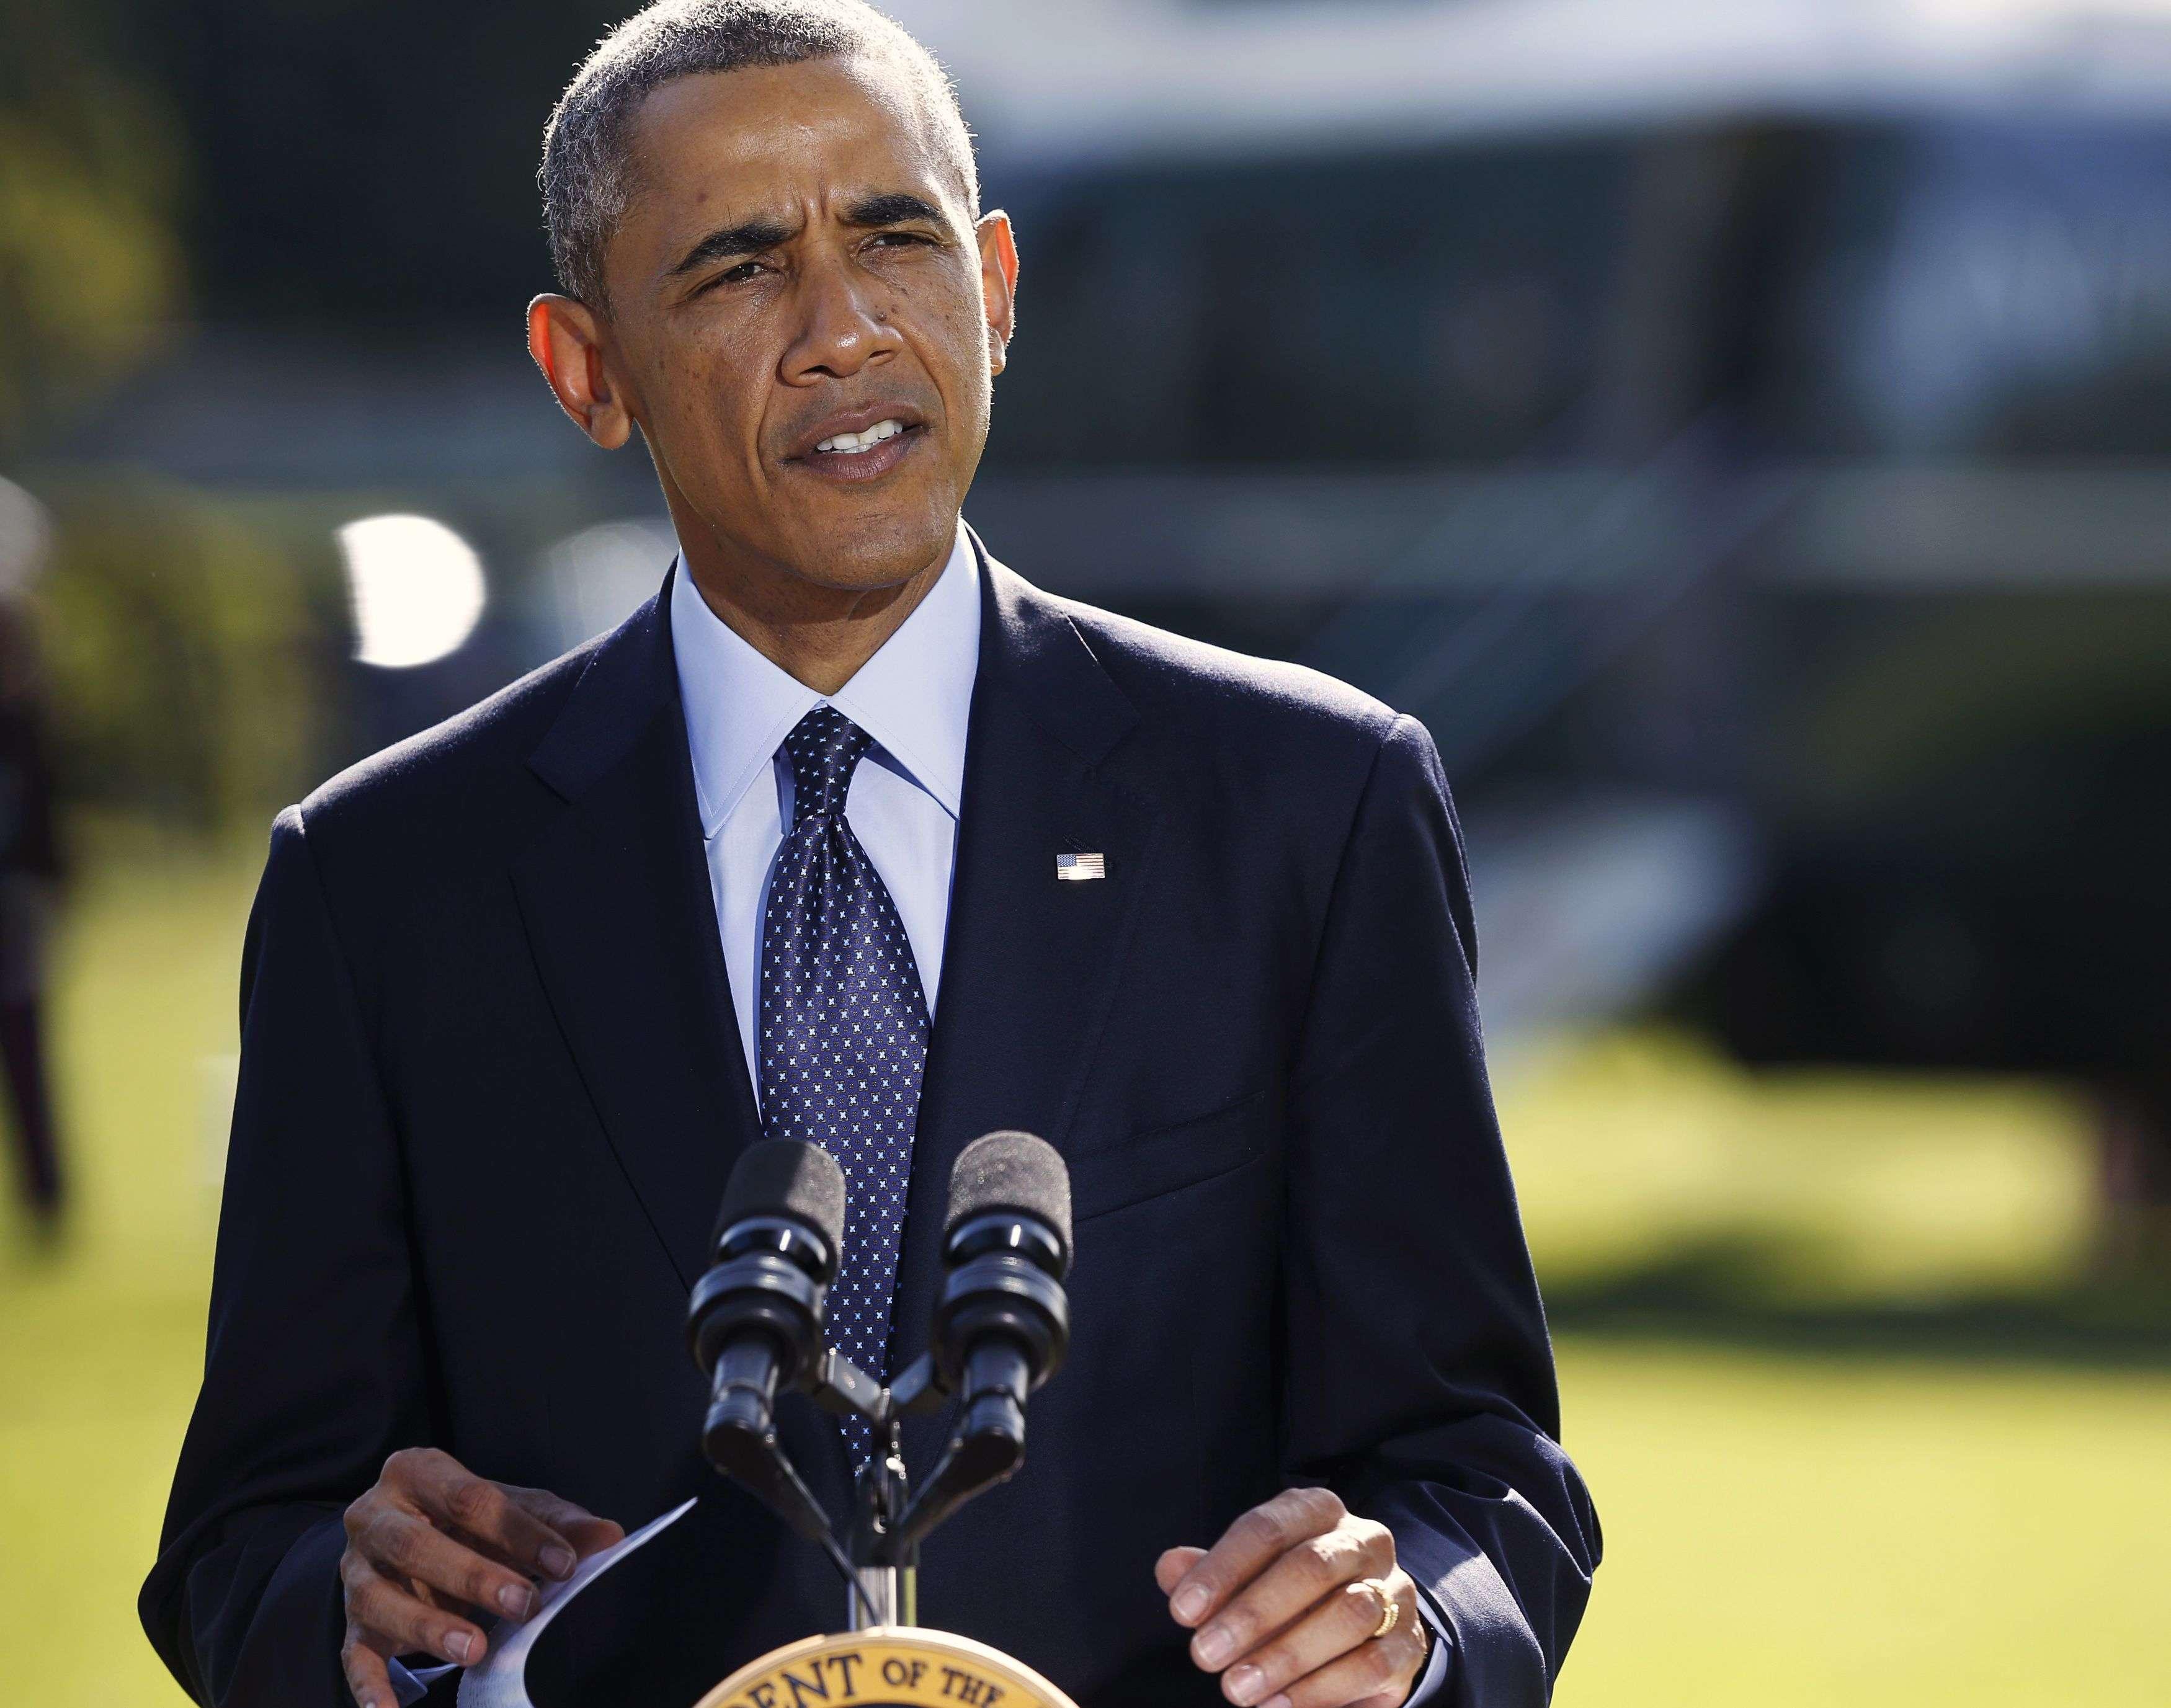 Obama falou da Casa Branca sobre ataques realizados contra os jihadistas da Síria Foto: Gary Cameron /Reuters